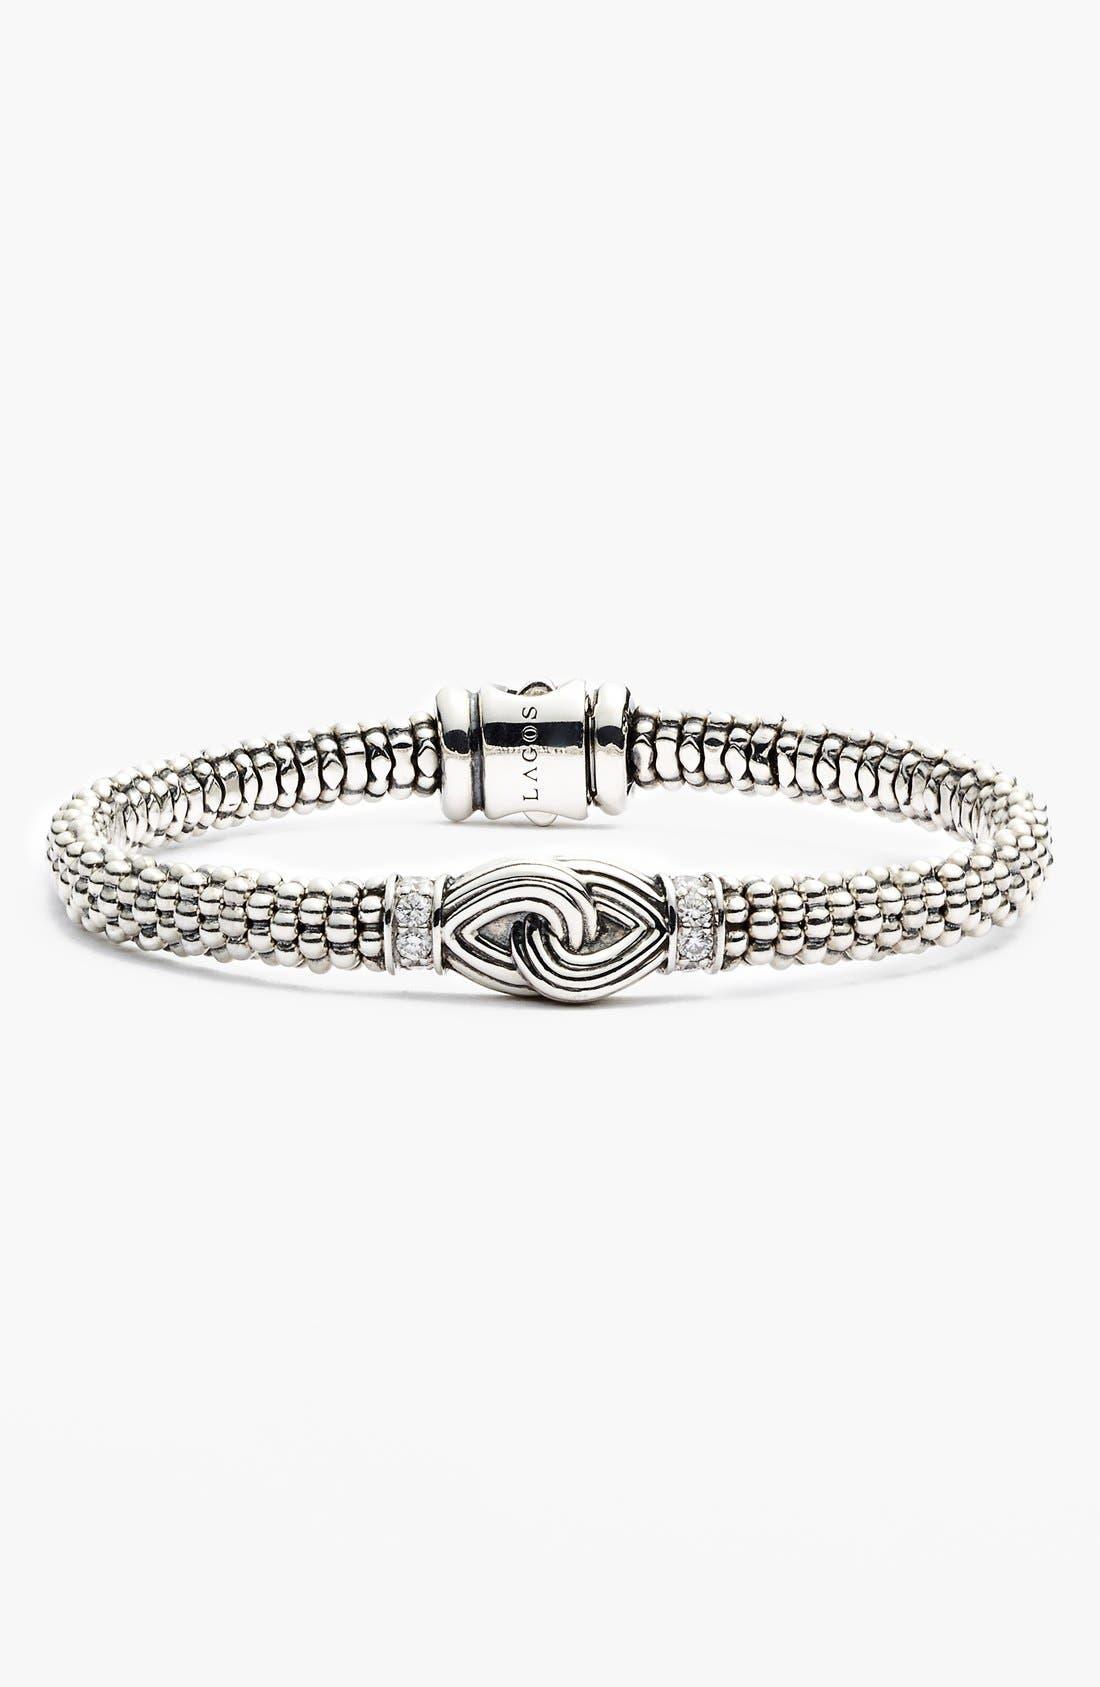 Alternate Image 1 Selected - LAGOS 'Silver Knot' Diamond & Caviar Station Bracelet (Nordstrom Online Exclusive)